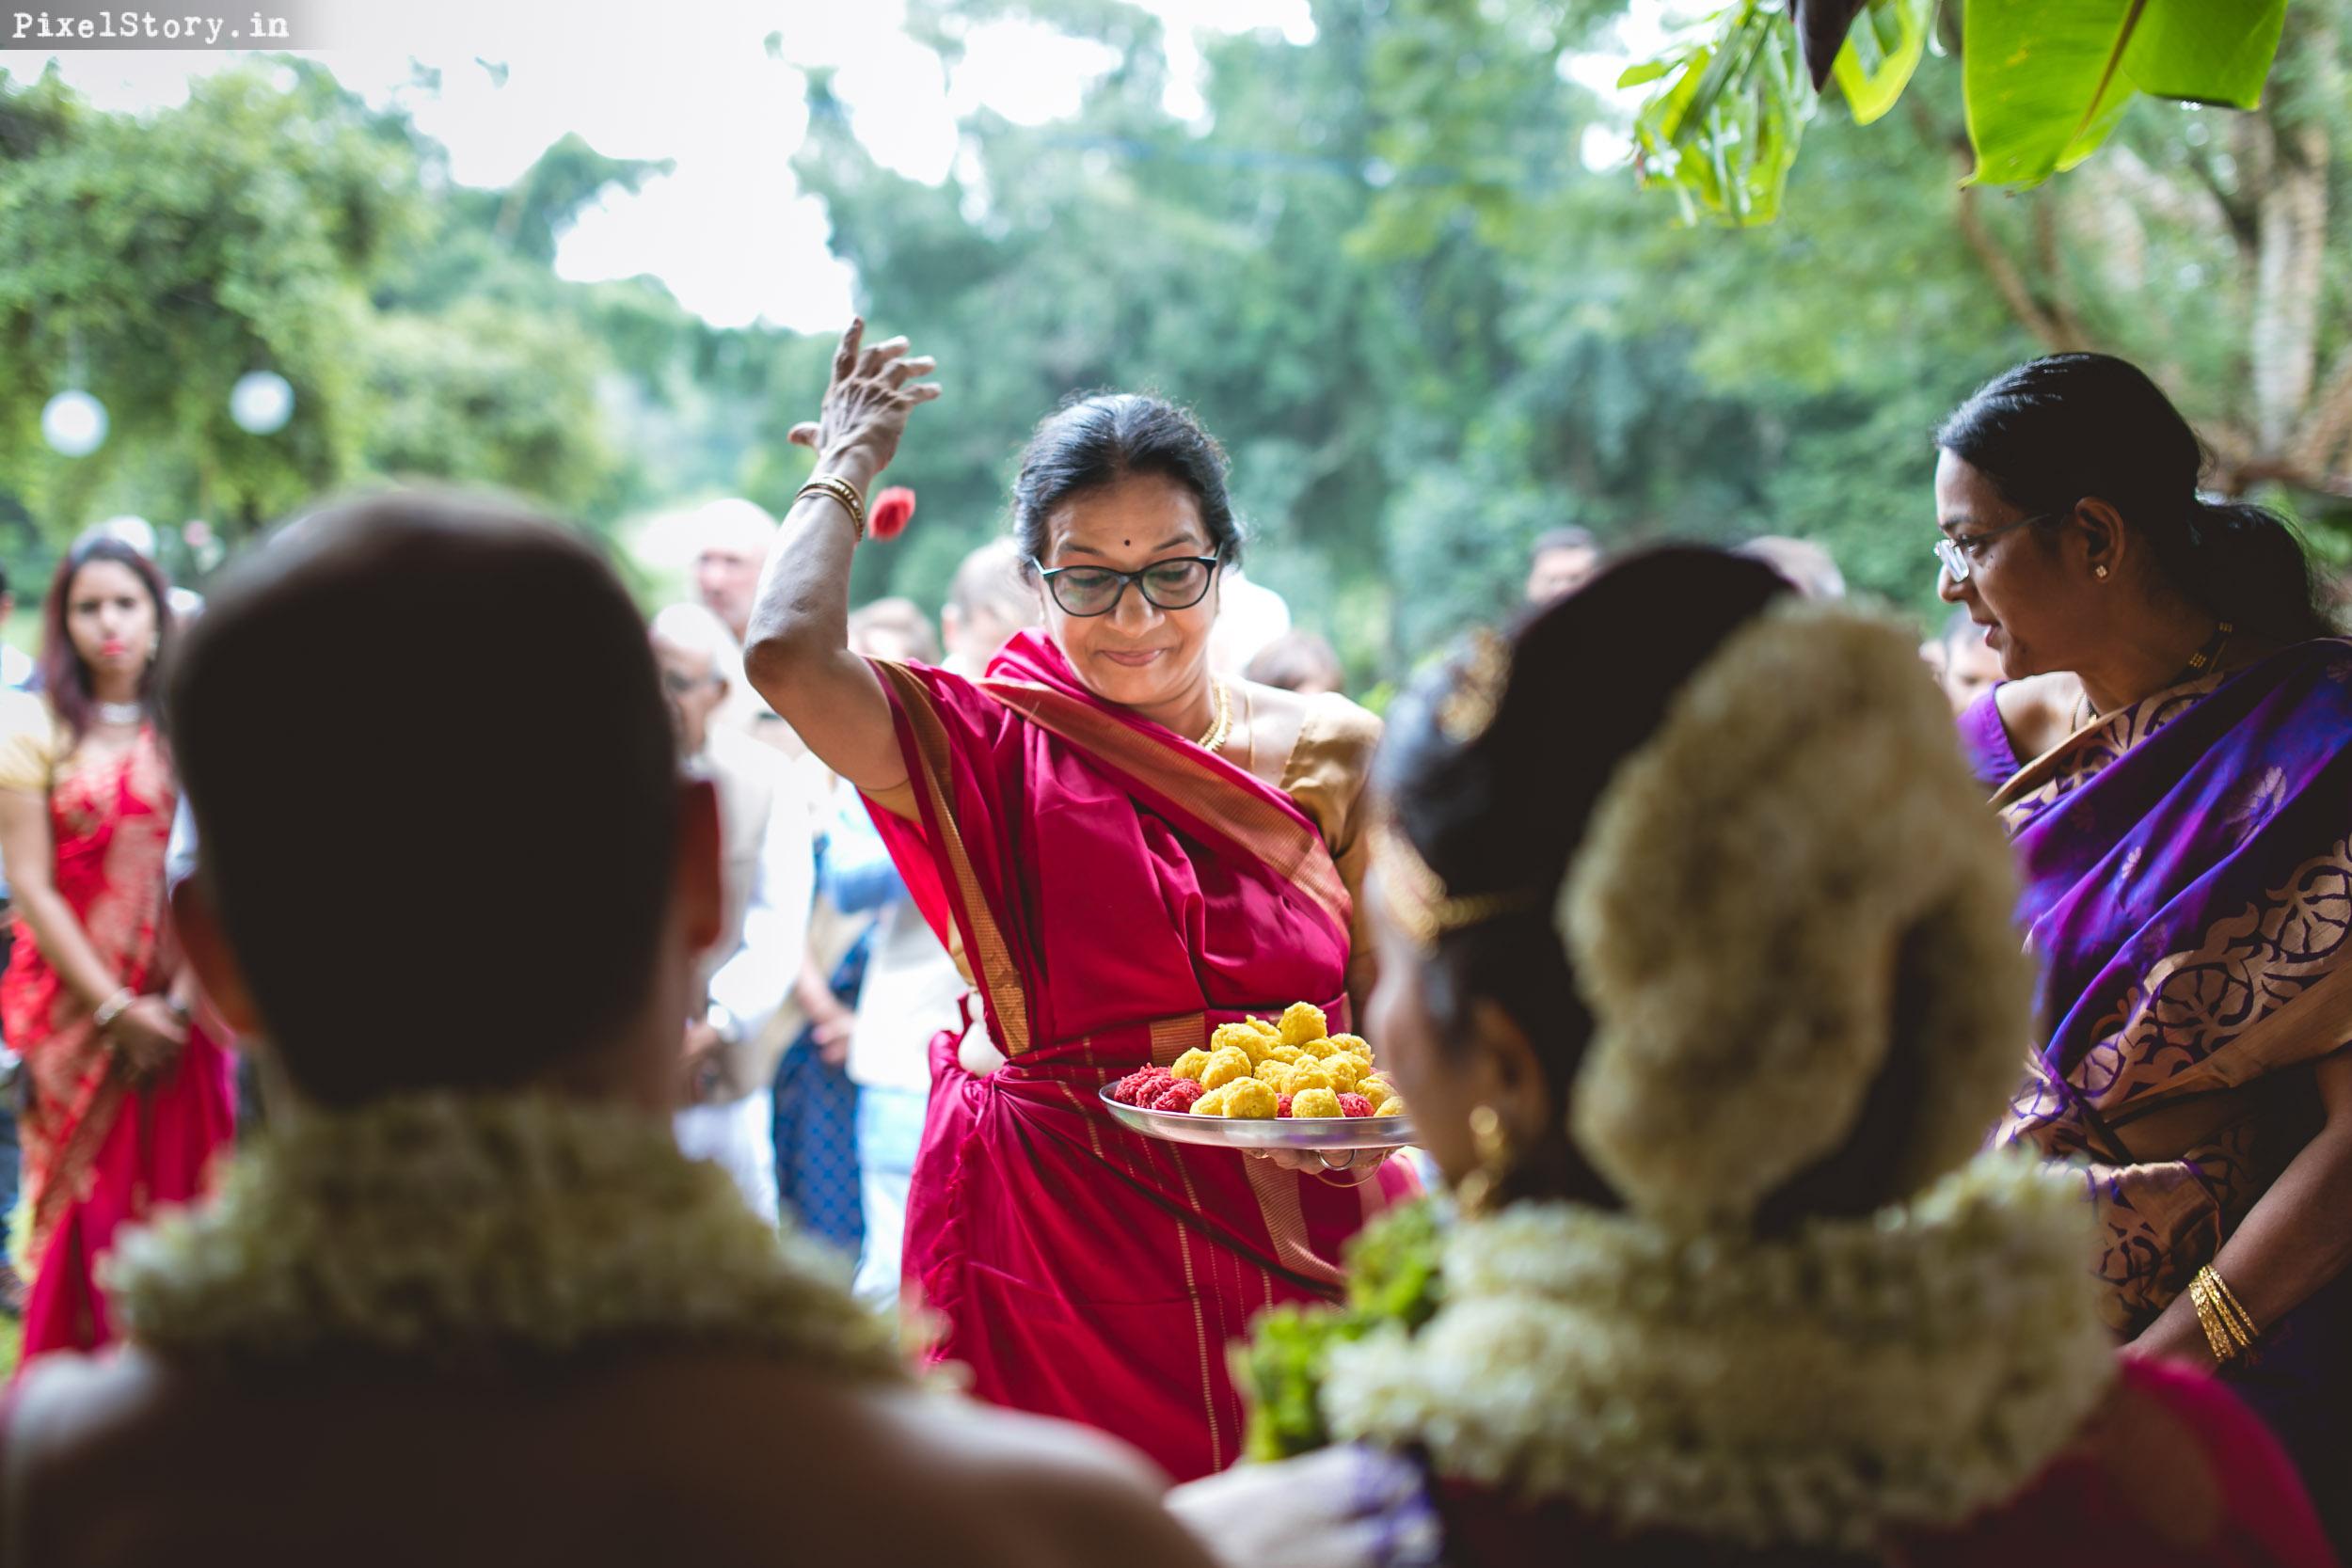 PixelStory-Jungle-Wedding-Photographer-Masinagudi-Indo-French042.jpg